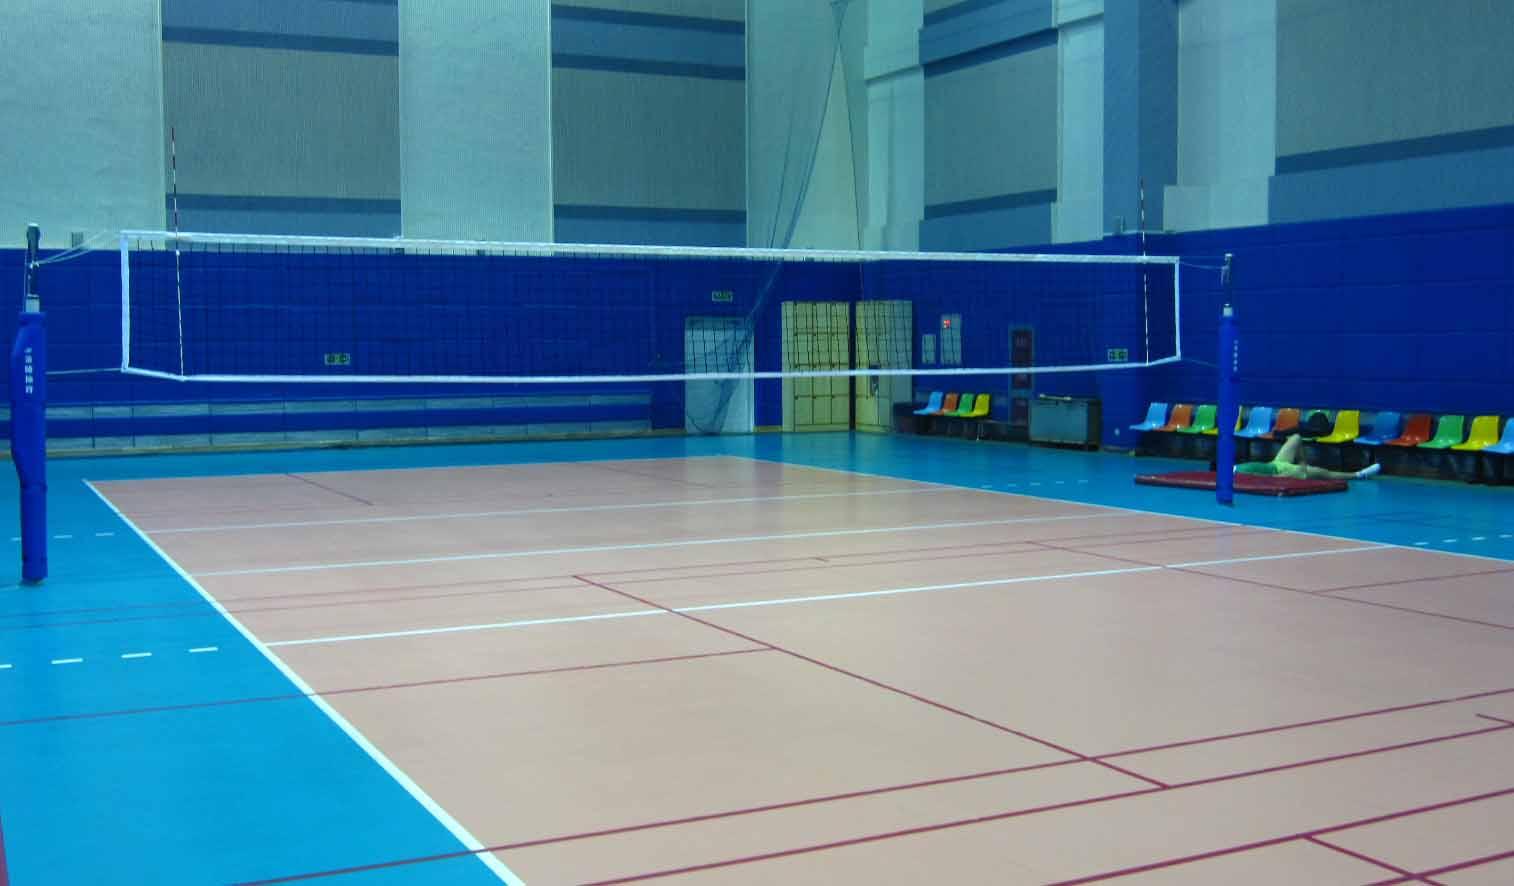 pvc运动地板有哪些优点?pvc运动地板的特点